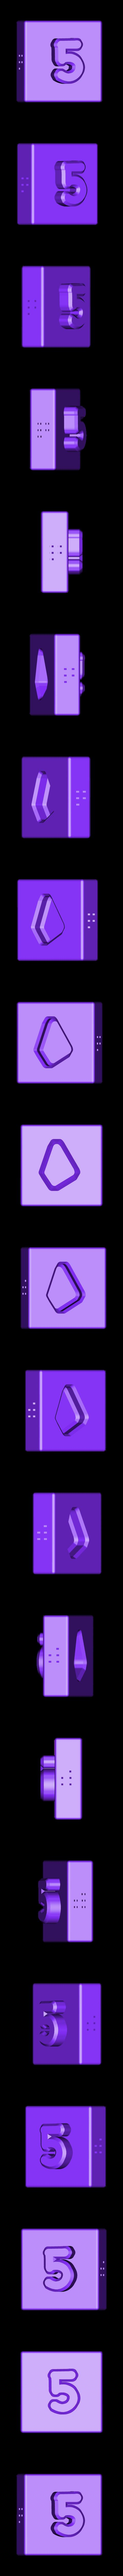 5.stl Download free STL file Mental blocks • Object to 3D print, RevK